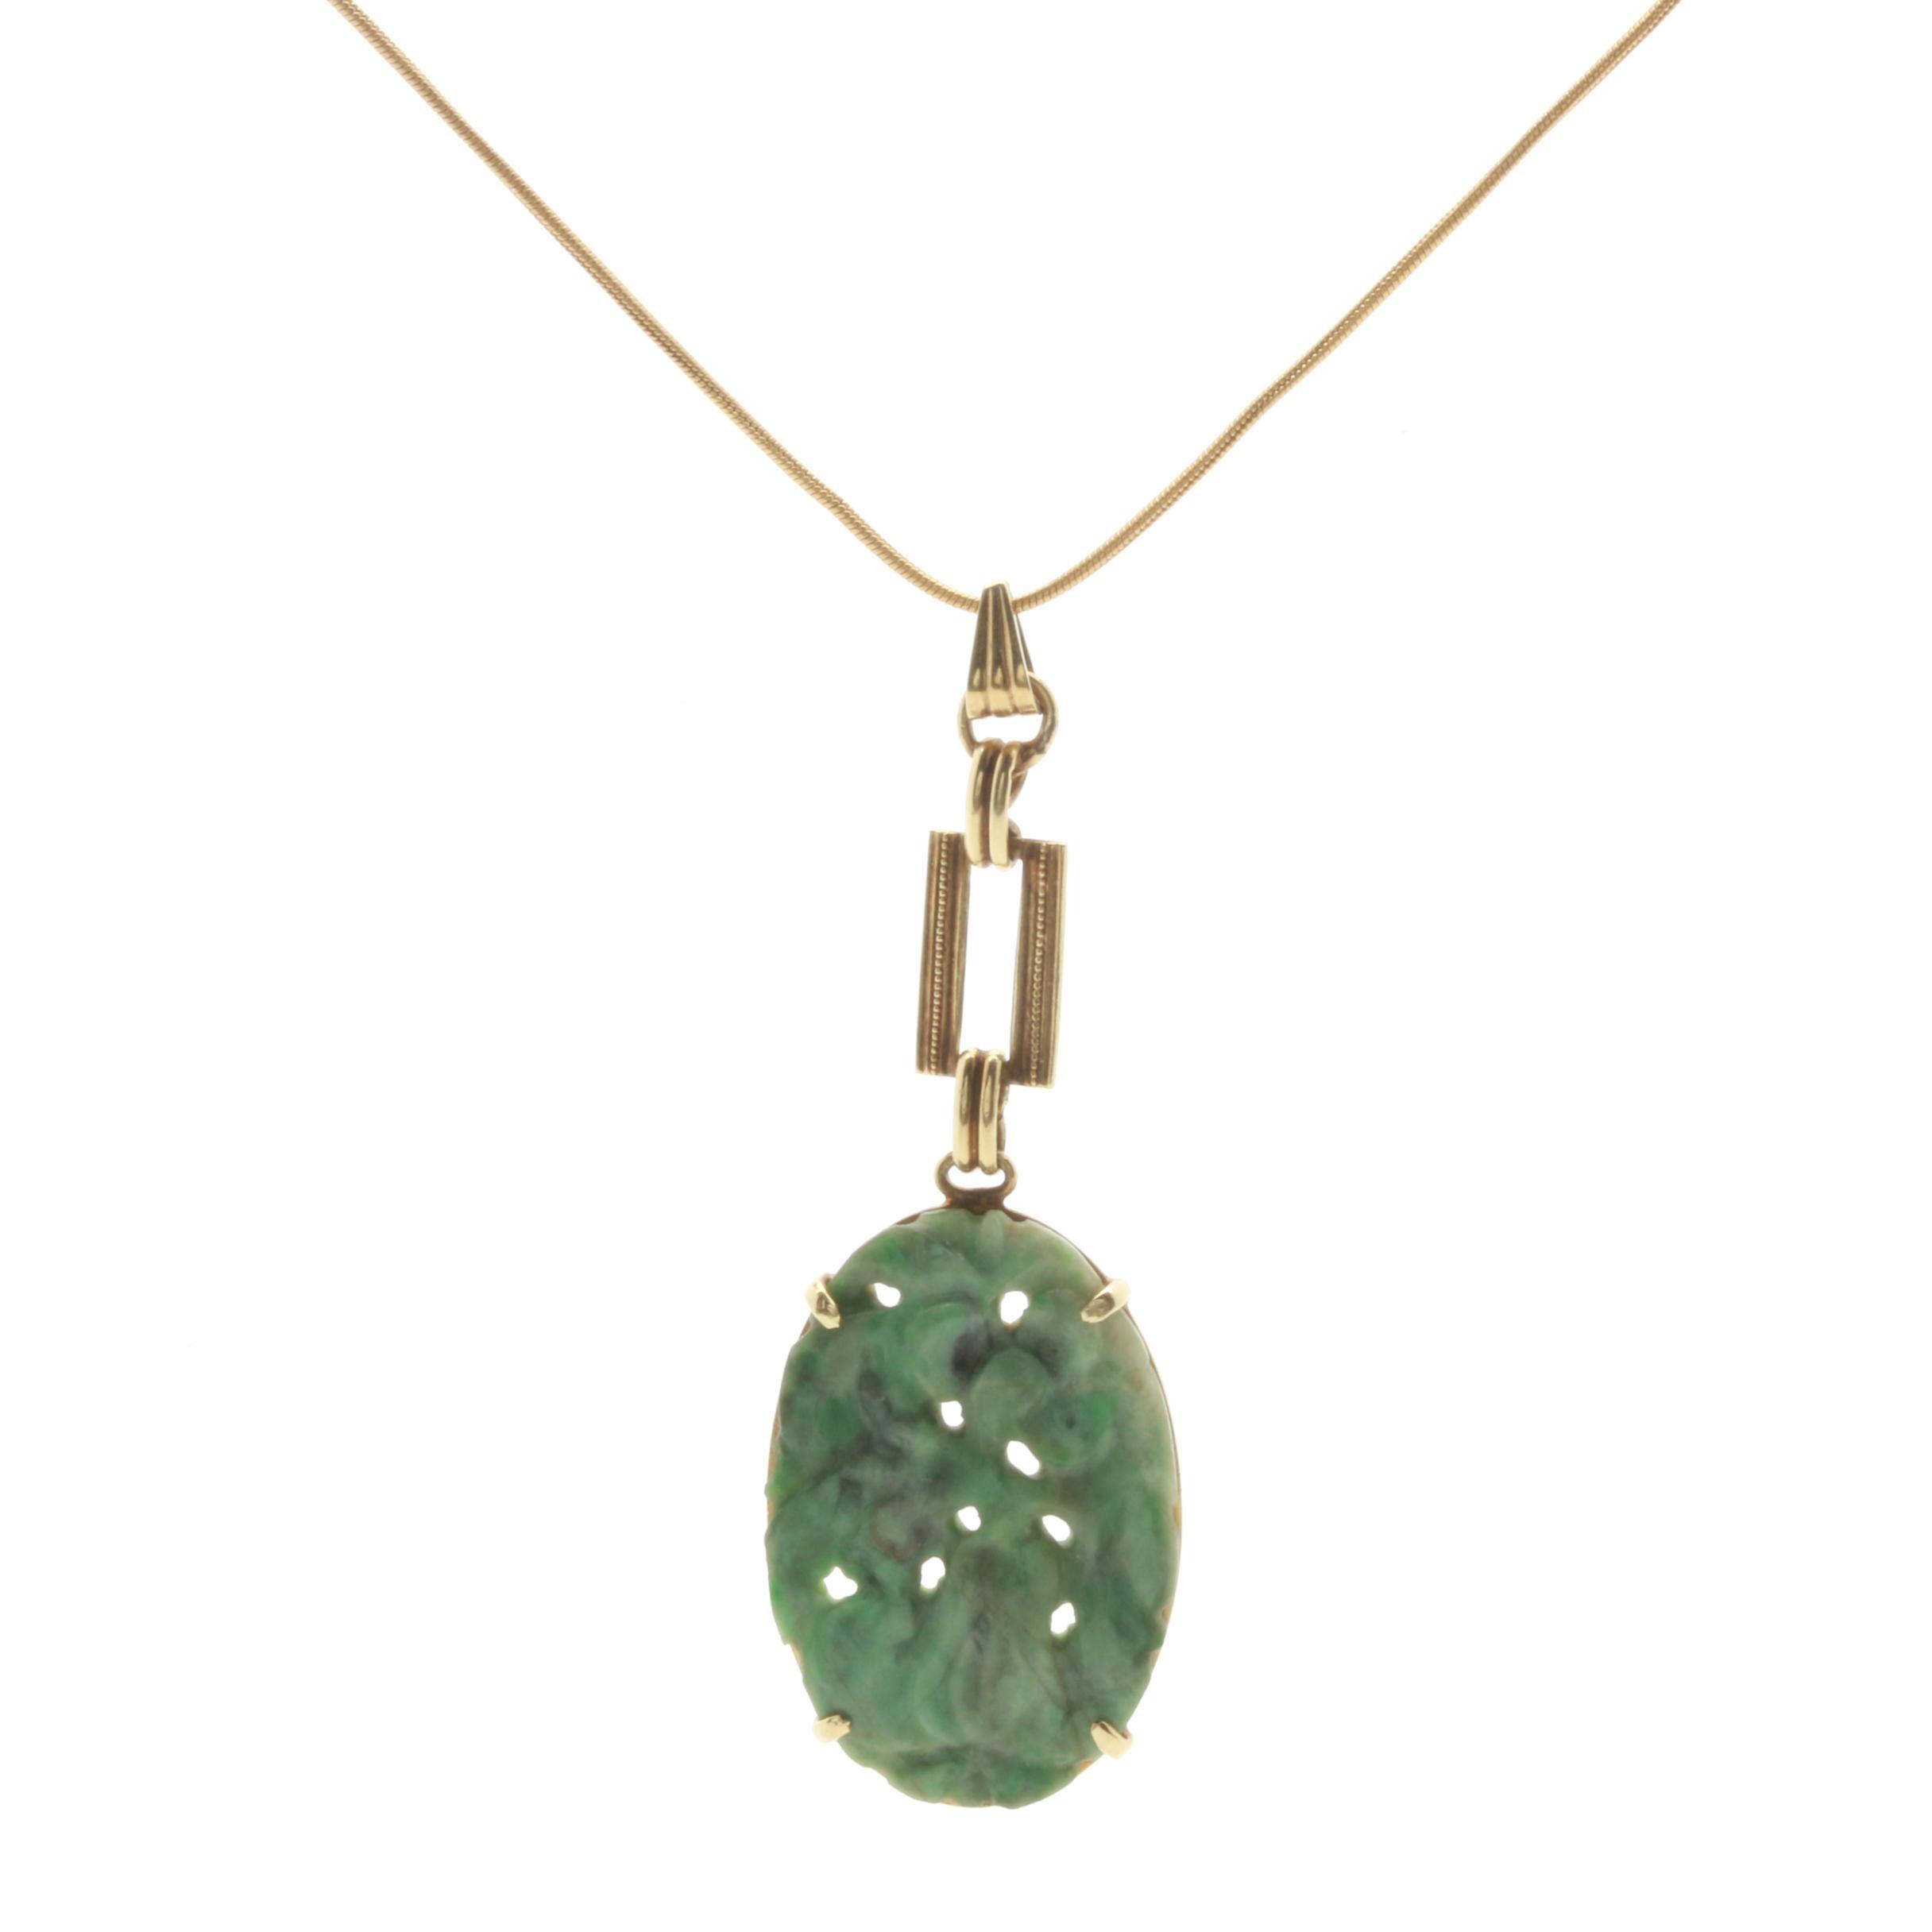 Vintage 14K Yellow Gold Nephrite Pendant Necklace